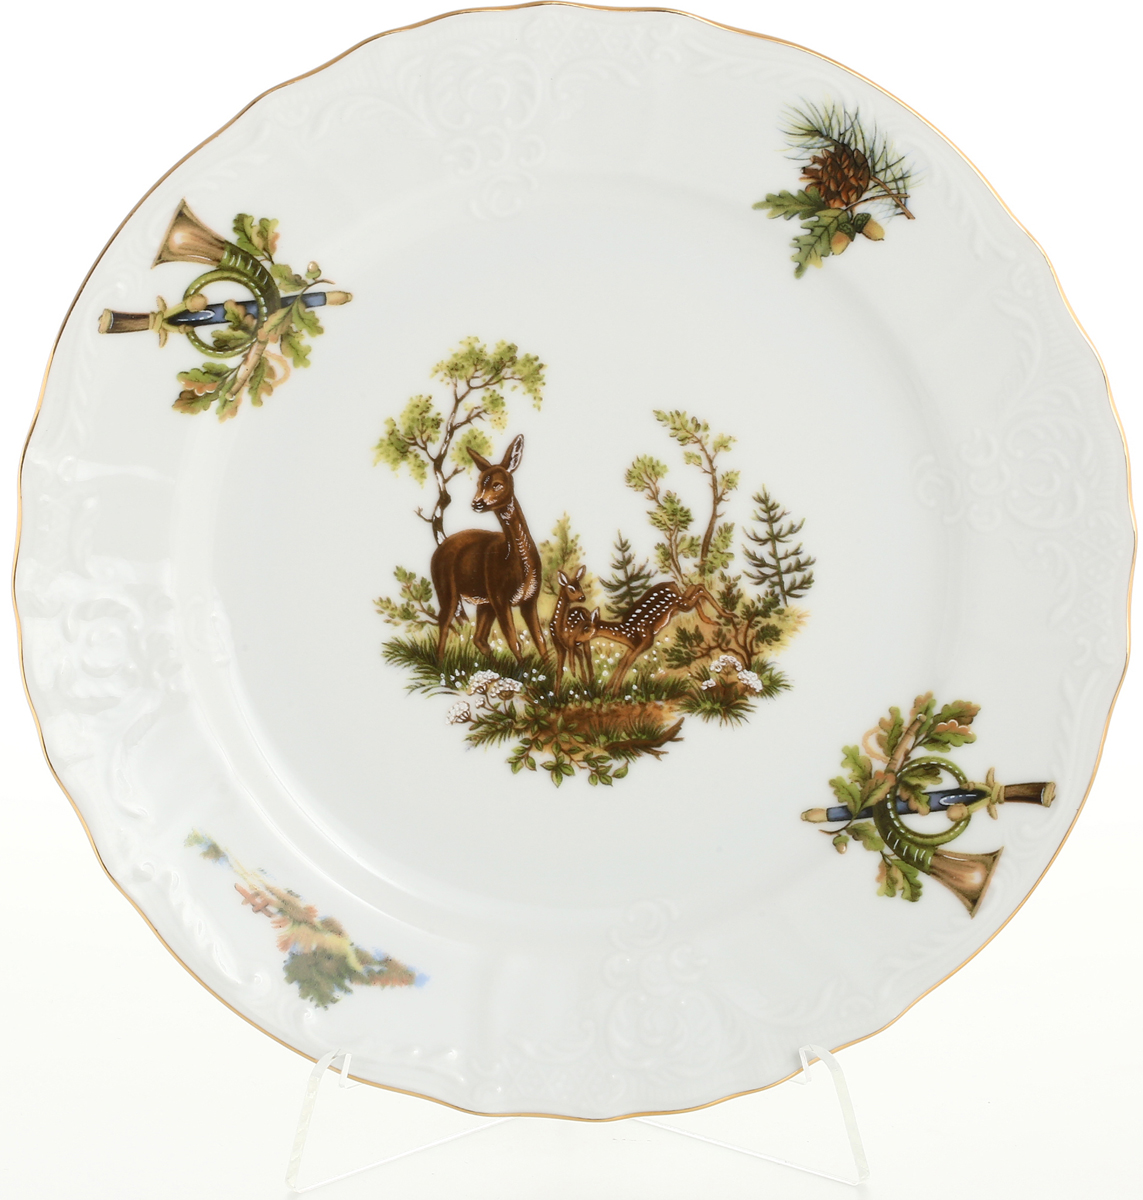 Набор тарелок Bernadotte Охота, диаметр 21 см, 6 шт набор из 2 тарелок 21 см infinity